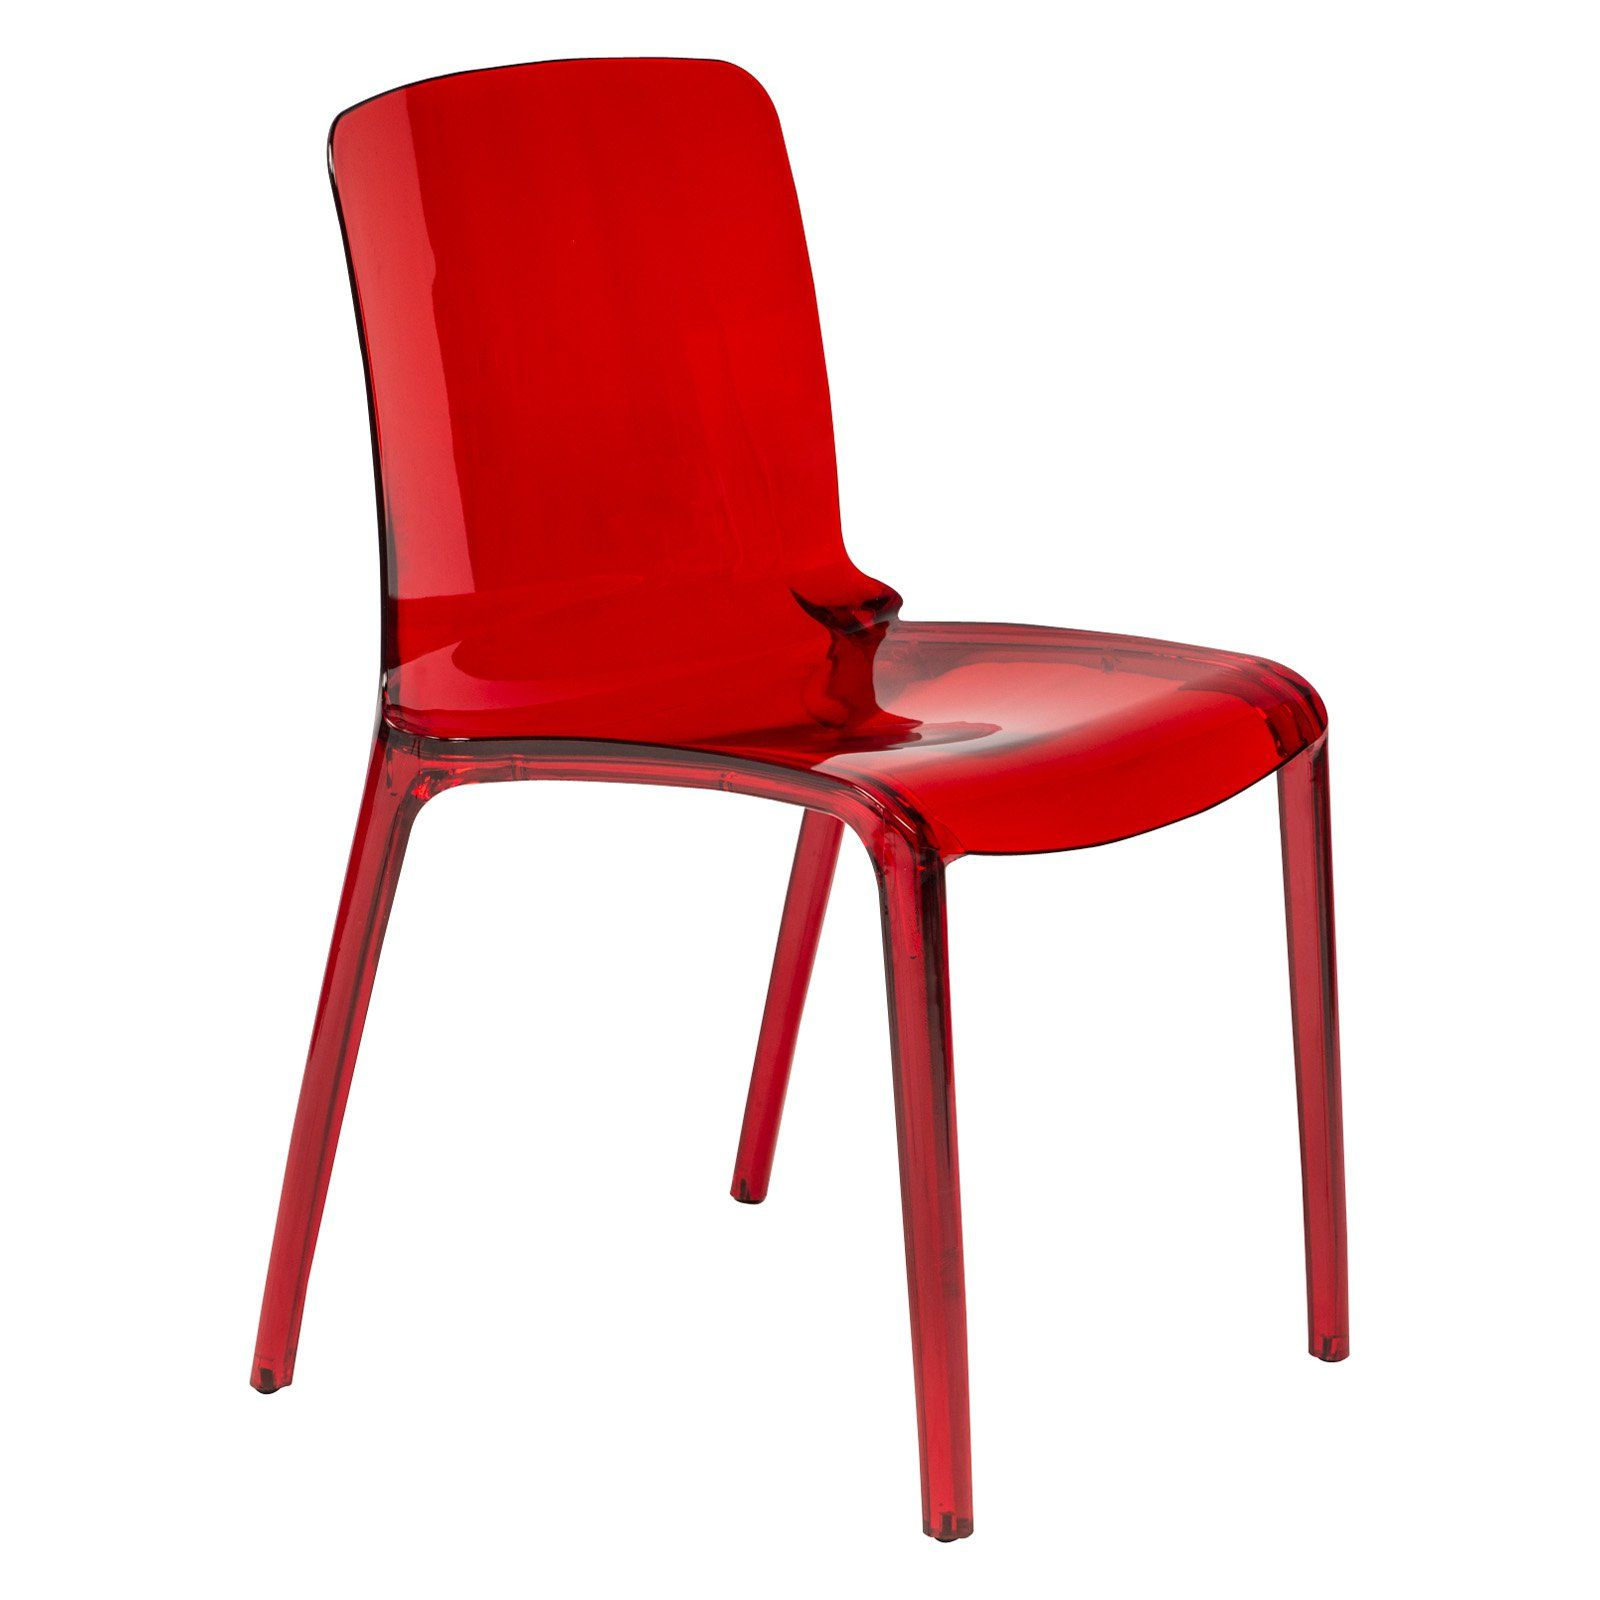 Groovy Leisuremod Murray Modern Stackable Dining Chair Transparent Beatyapartments Chair Design Images Beatyapartmentscom